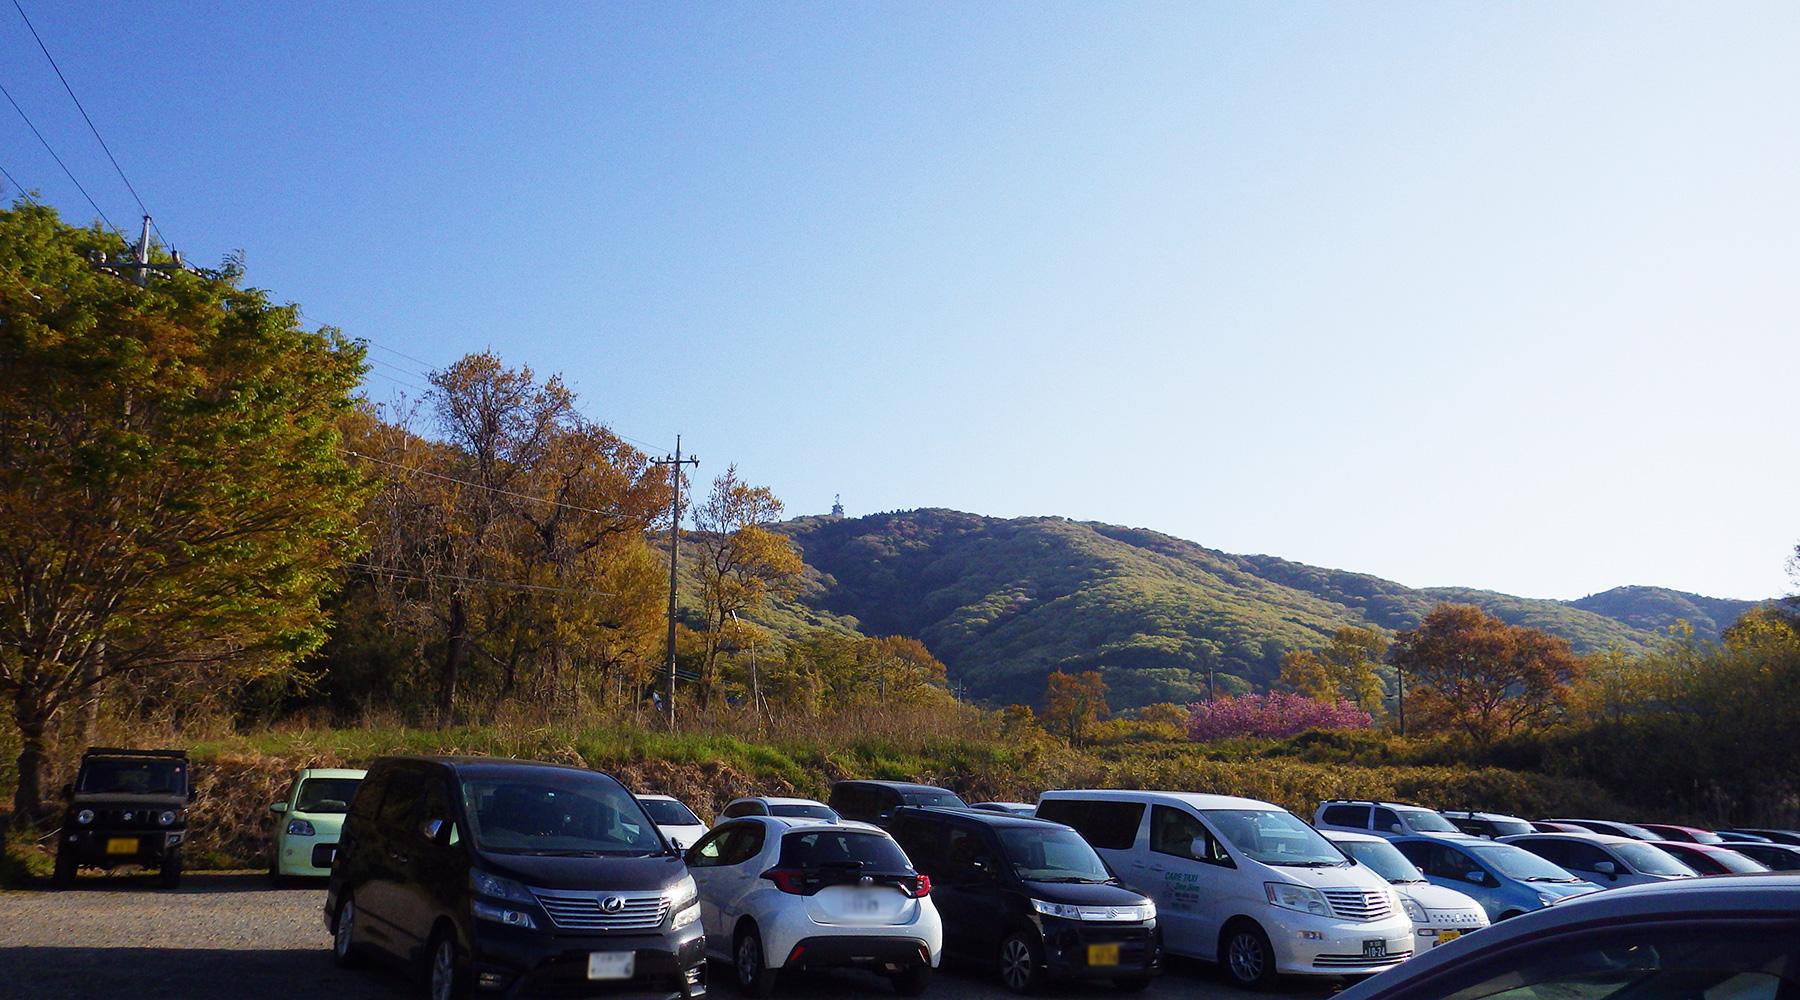 宝篋山・小田休憩所隣の駐車場